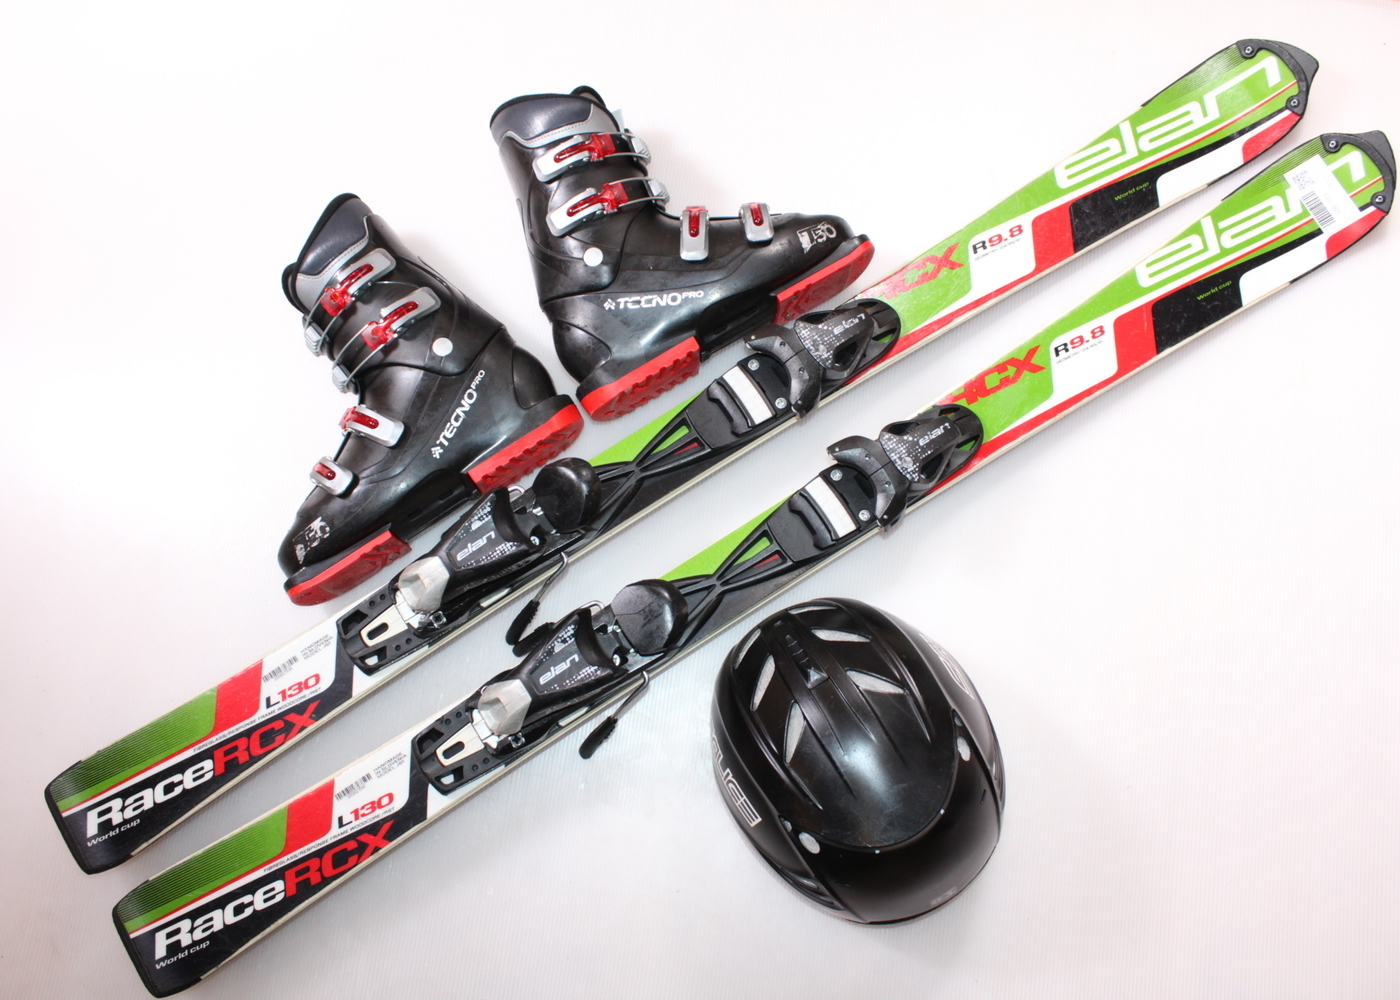 Dětské lyže ELAN RACE RCX 130 cm + lyžáky  38EU + helma